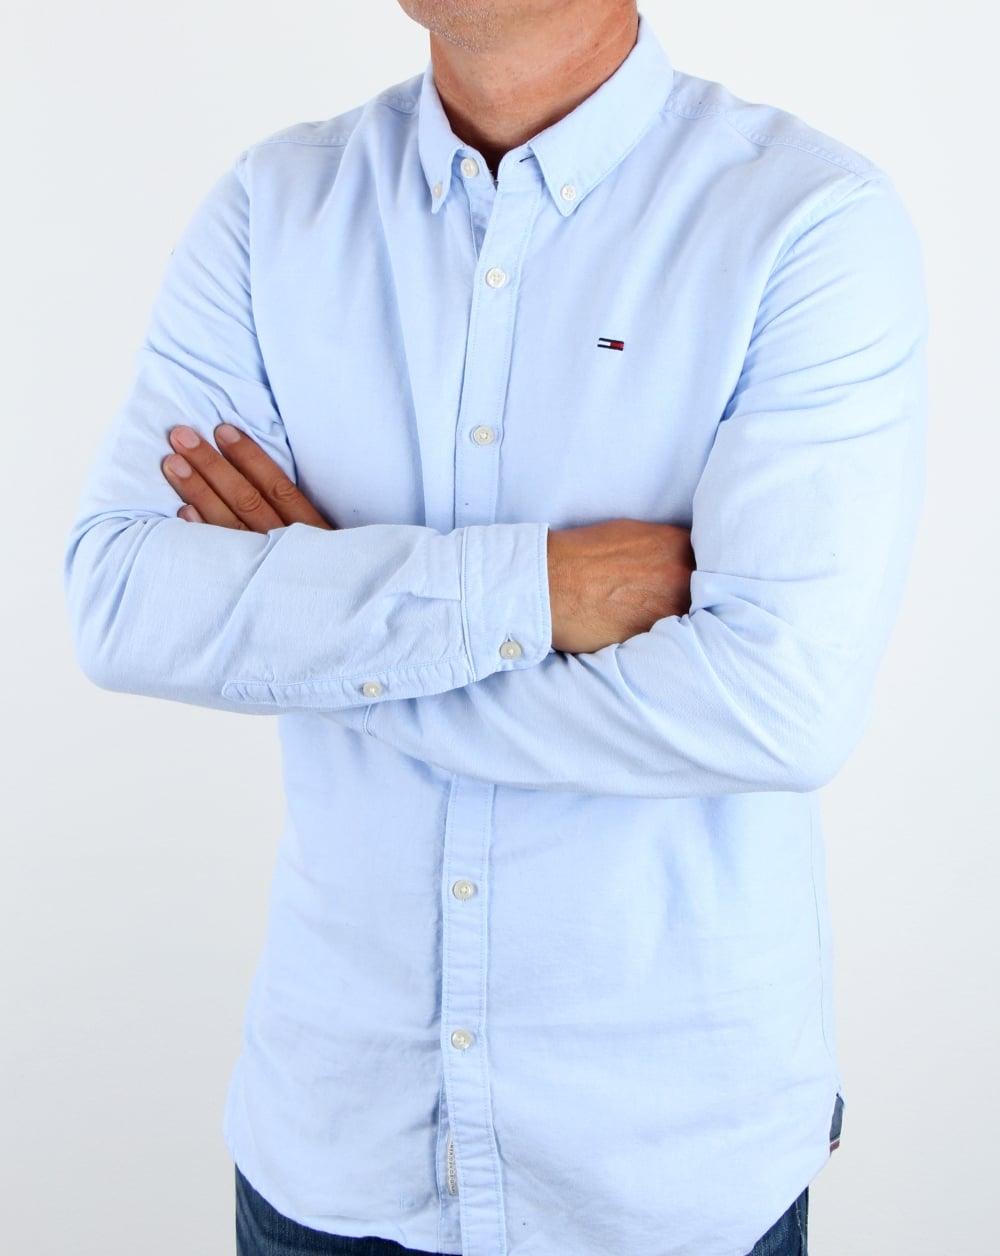 7a016c5a Tommy Hilfiger Cotton Oxford Shirt Light Blue,long sleeve,mens